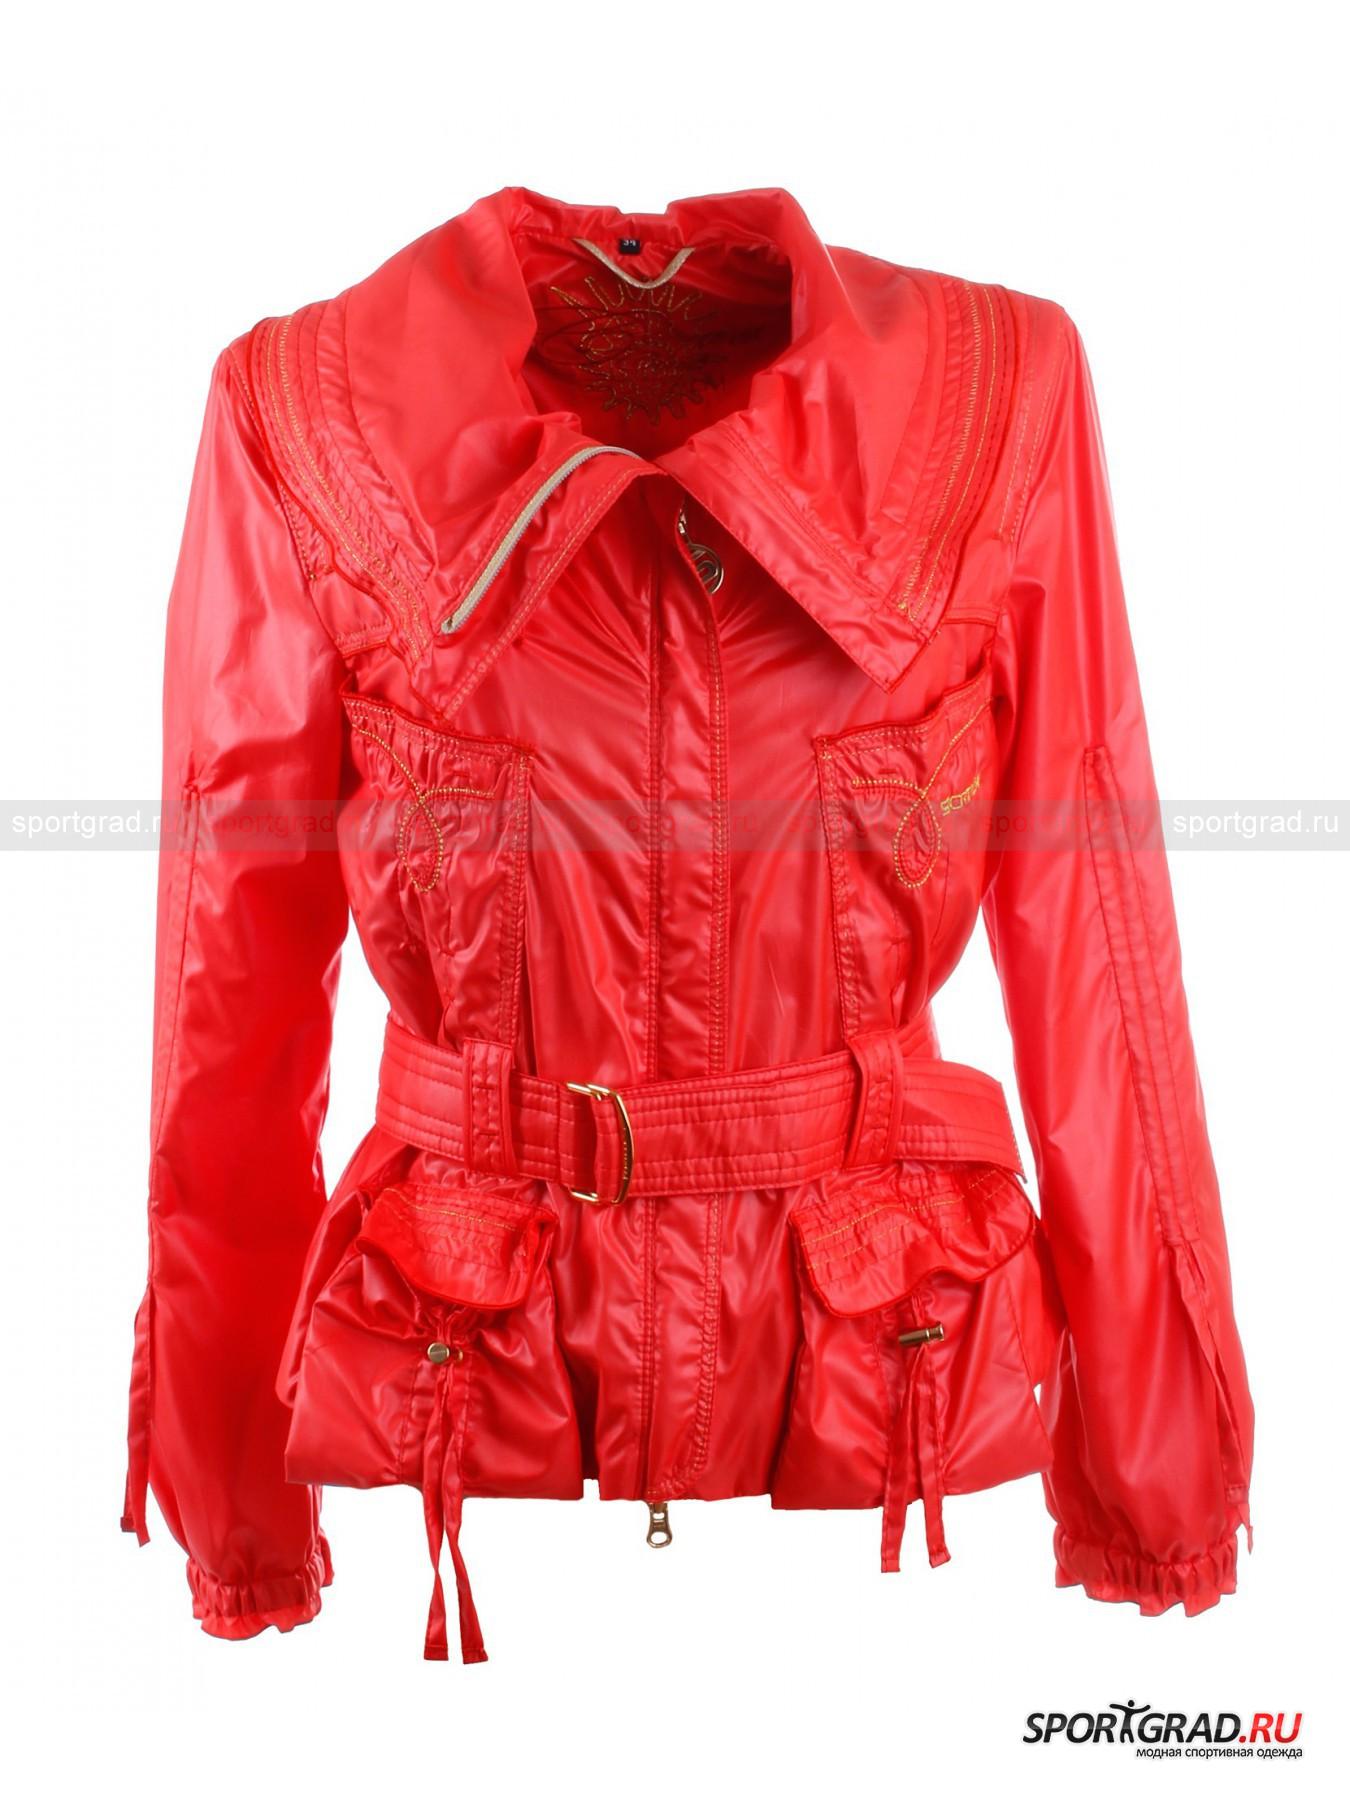 Куртка женская SPORTALM Jette от Спортград